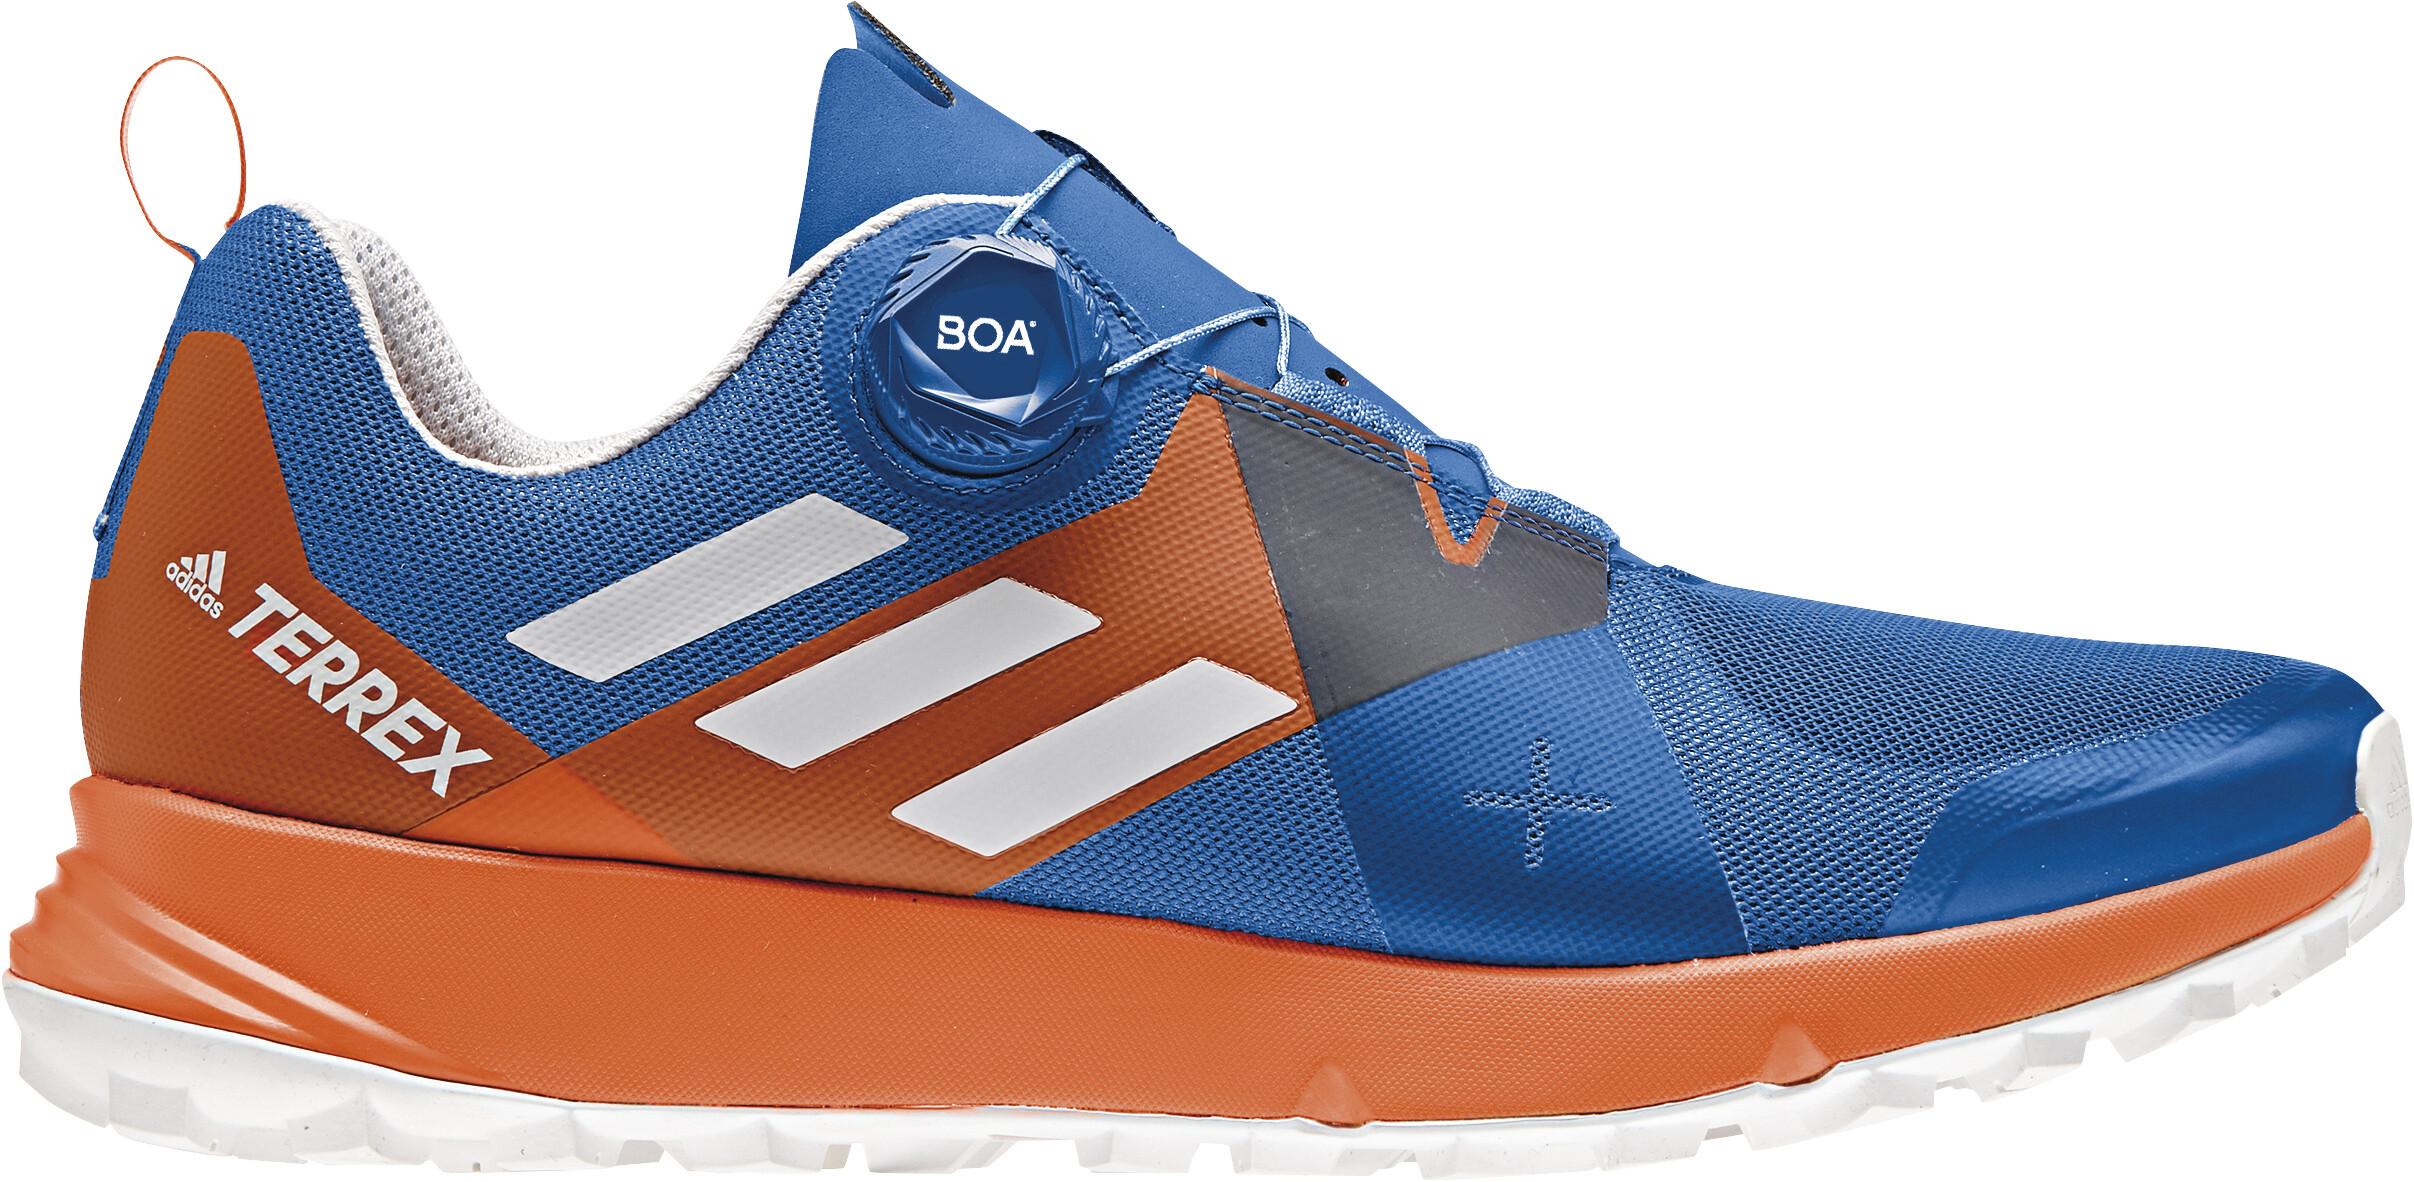 Teva Men S Shoes Size